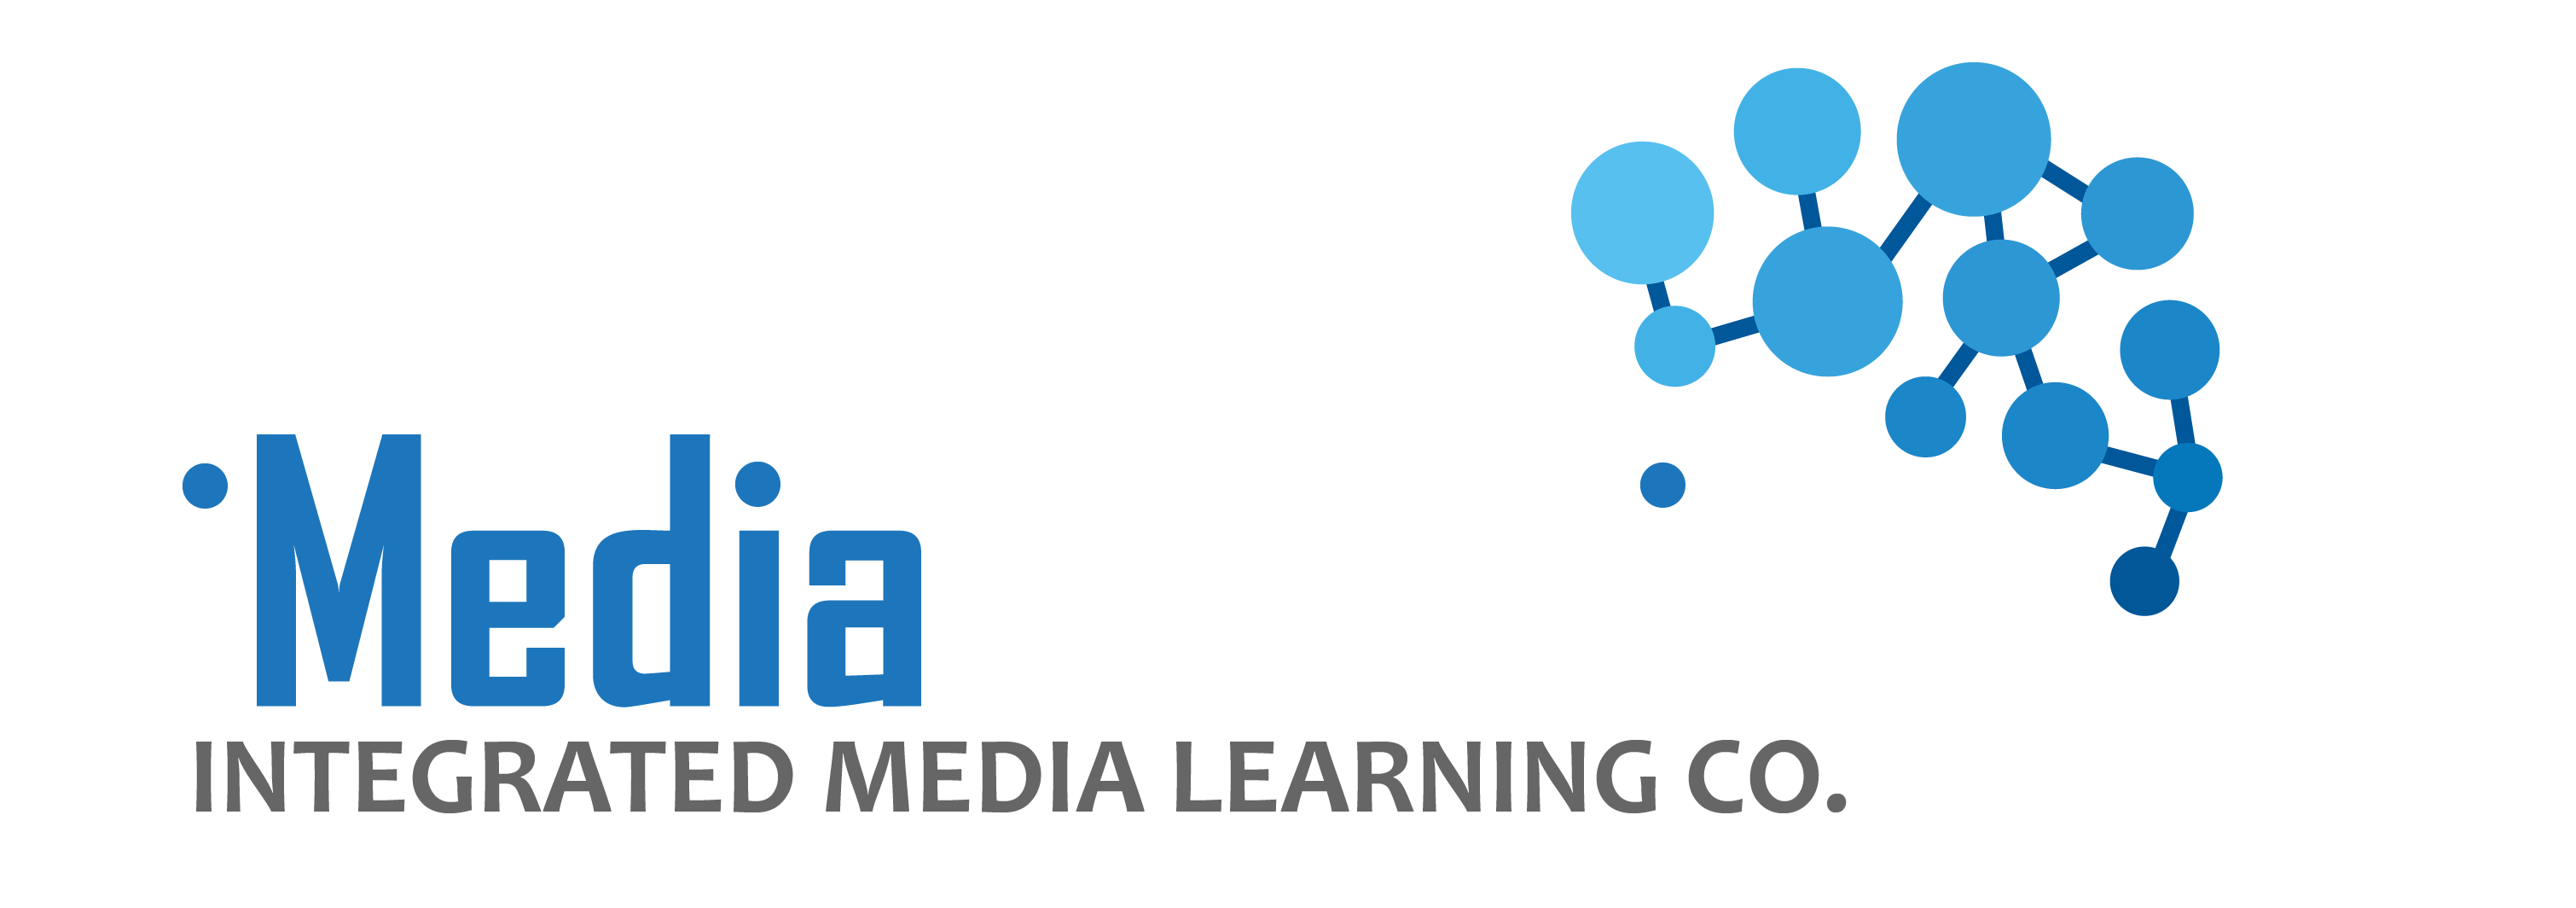 iMediaLearning.com